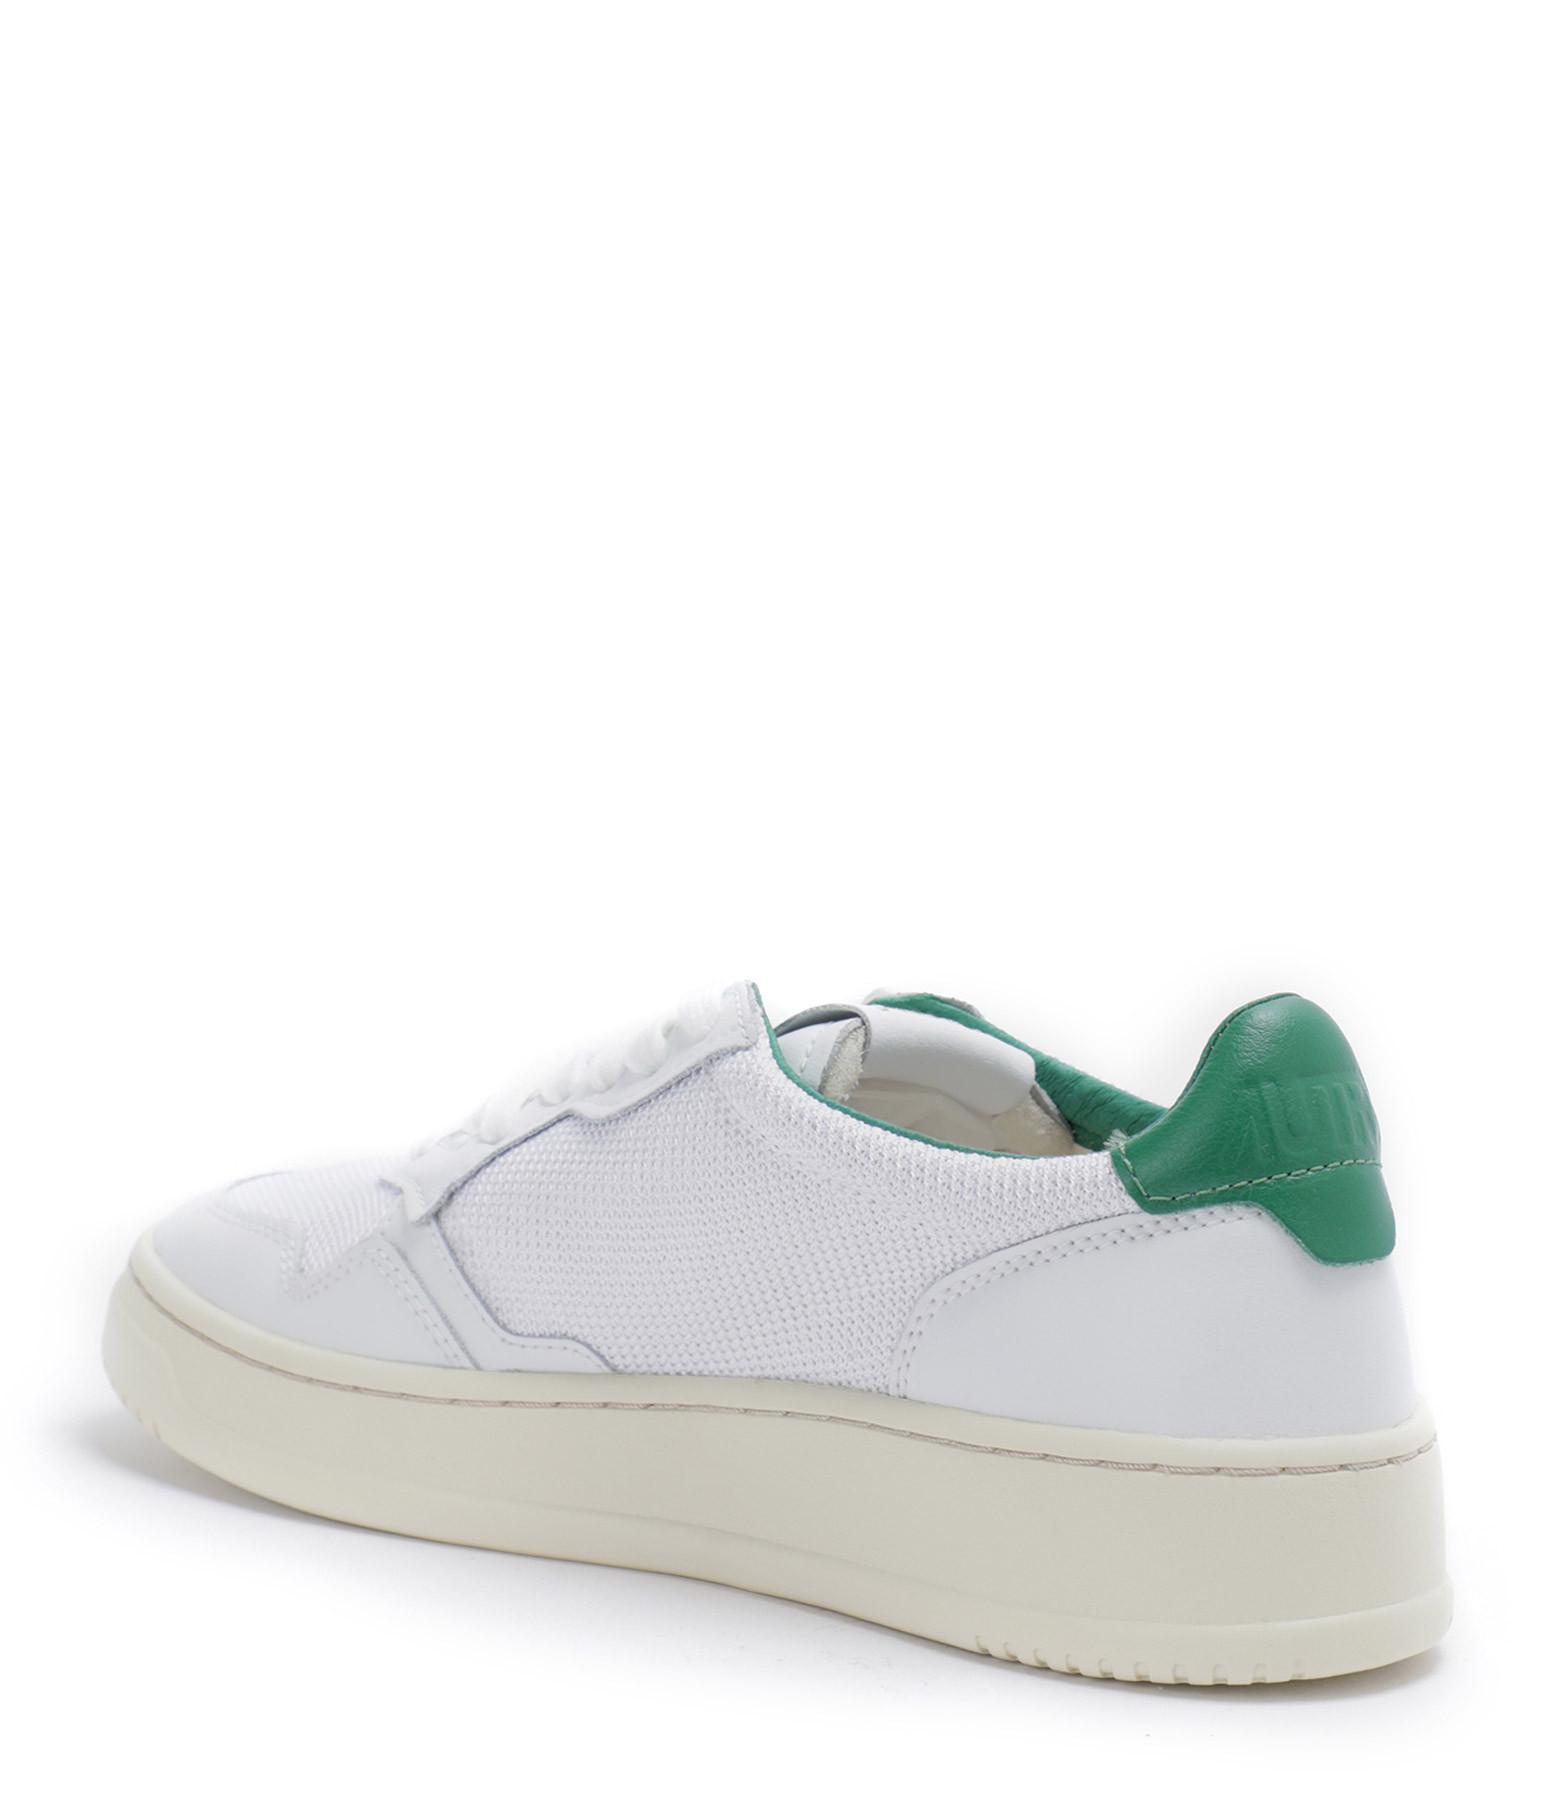 AUTRY - Baskets 01 Low Cuir Blanc Vert